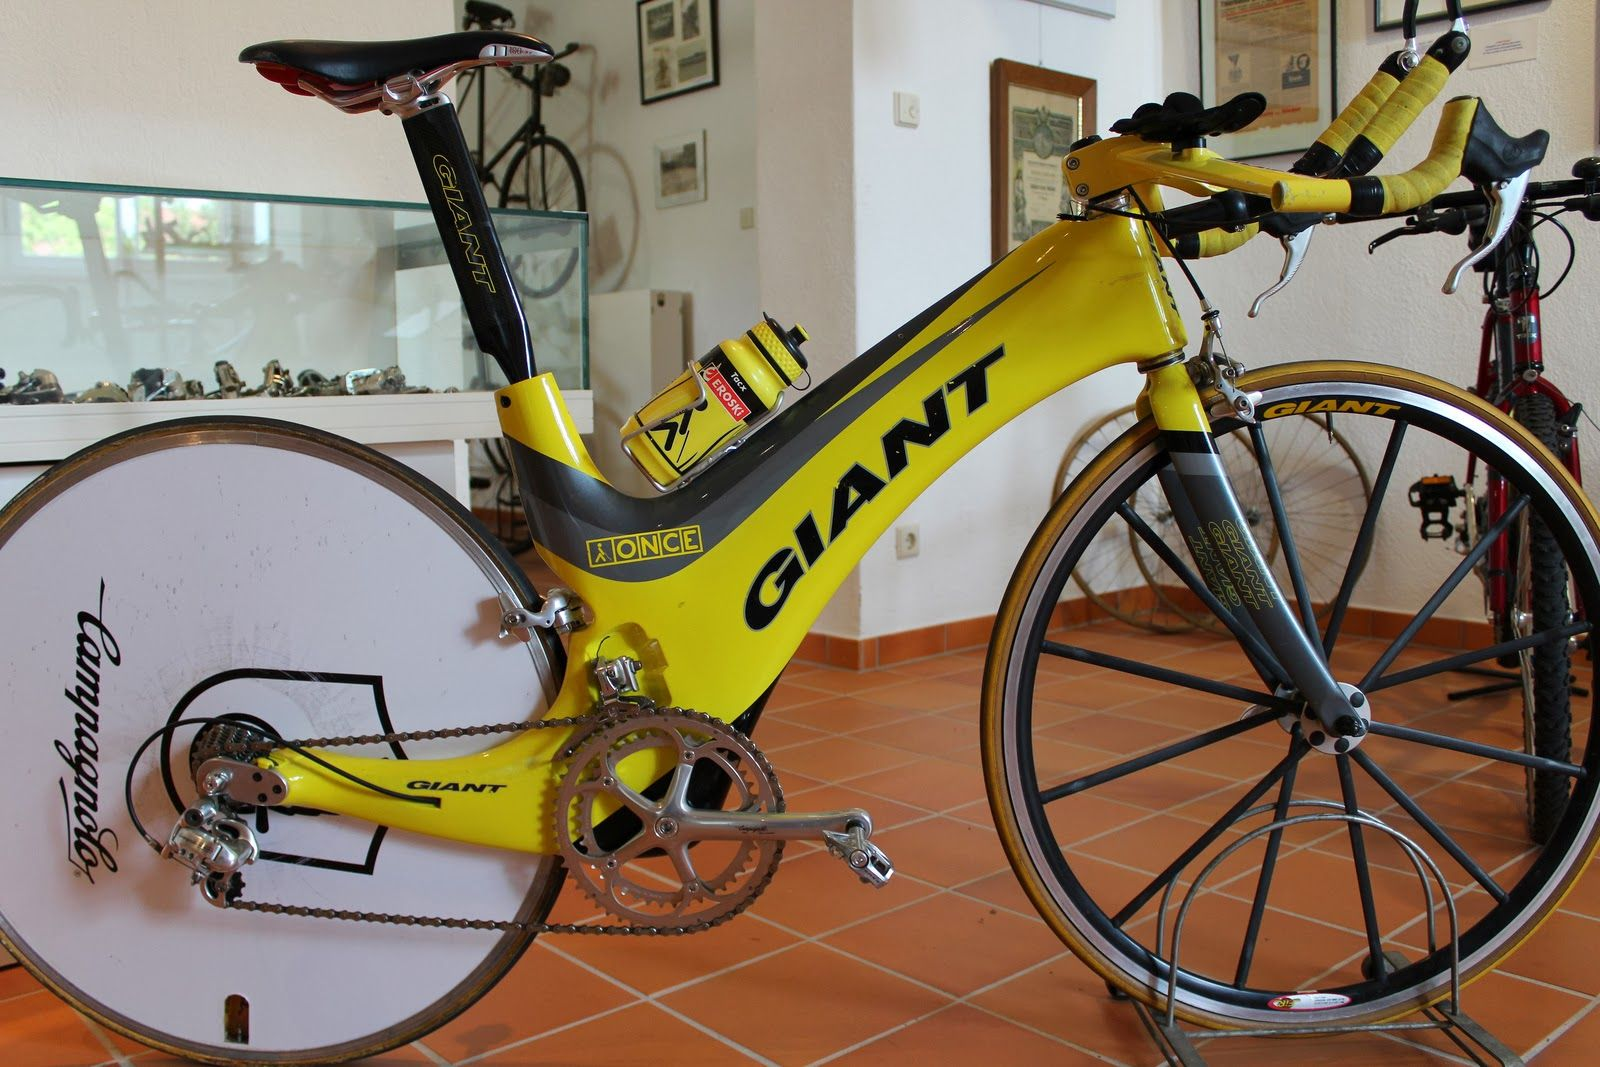 Giant TT bike 1990 s  d13fa2174